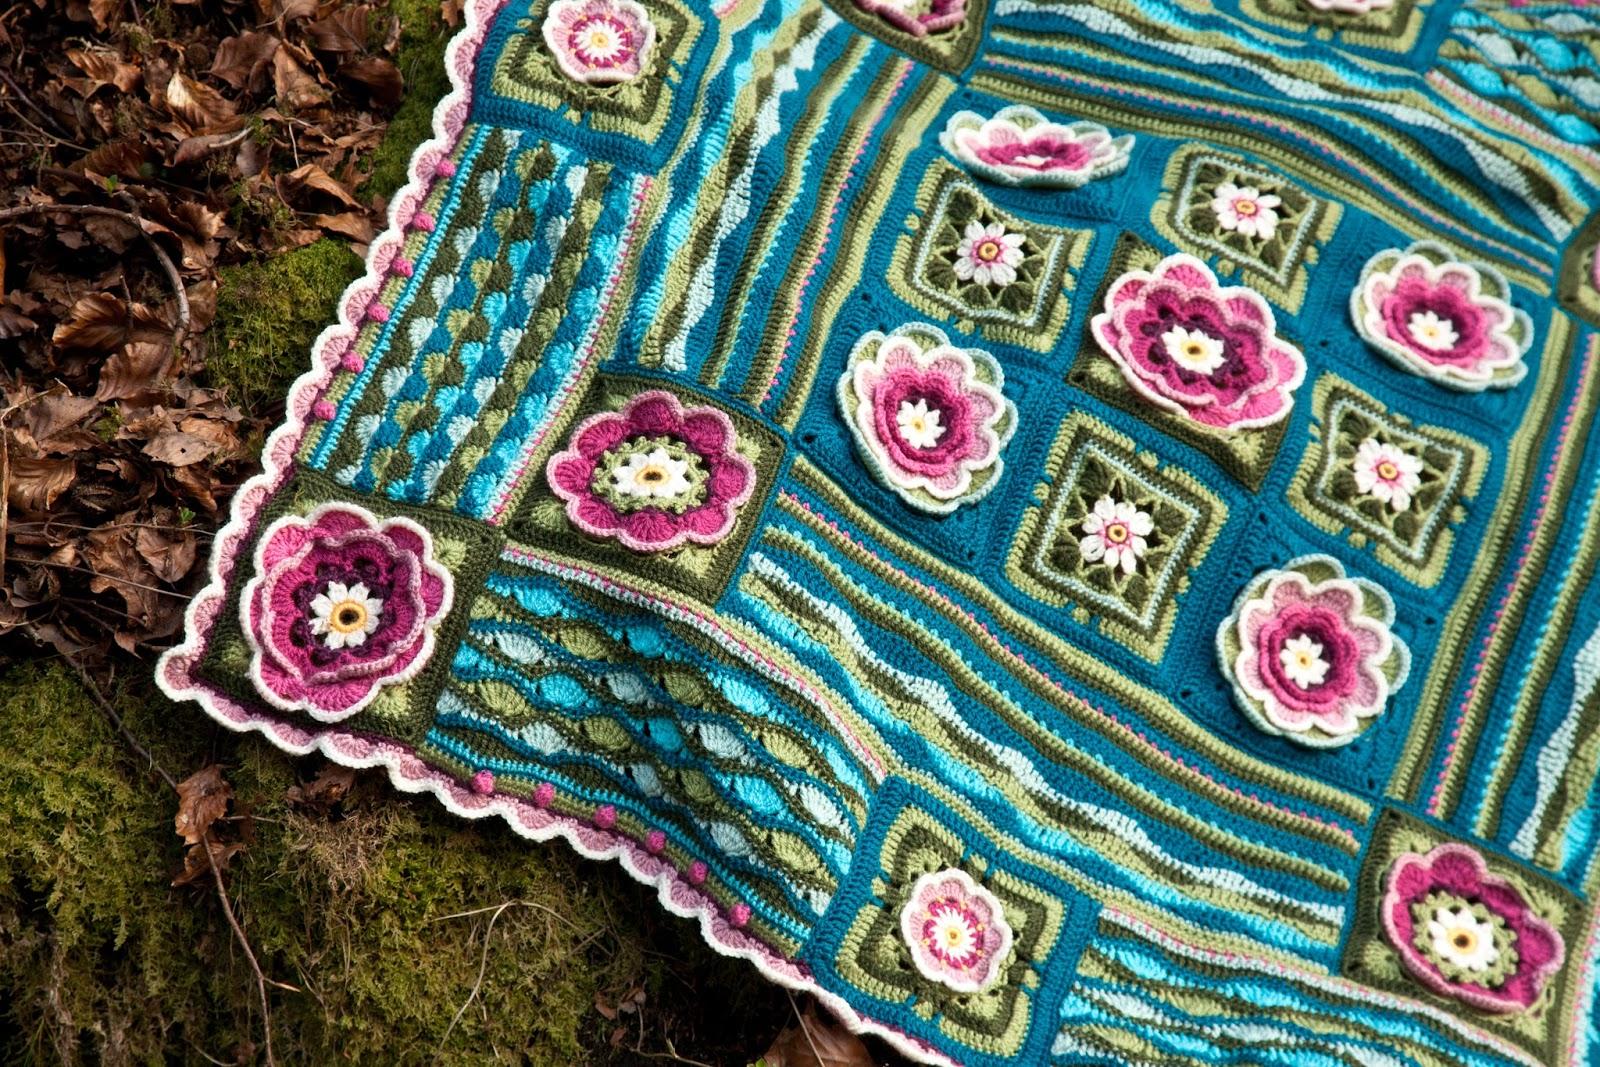 Knit Crochet Design Lily Pond Cal Set 8